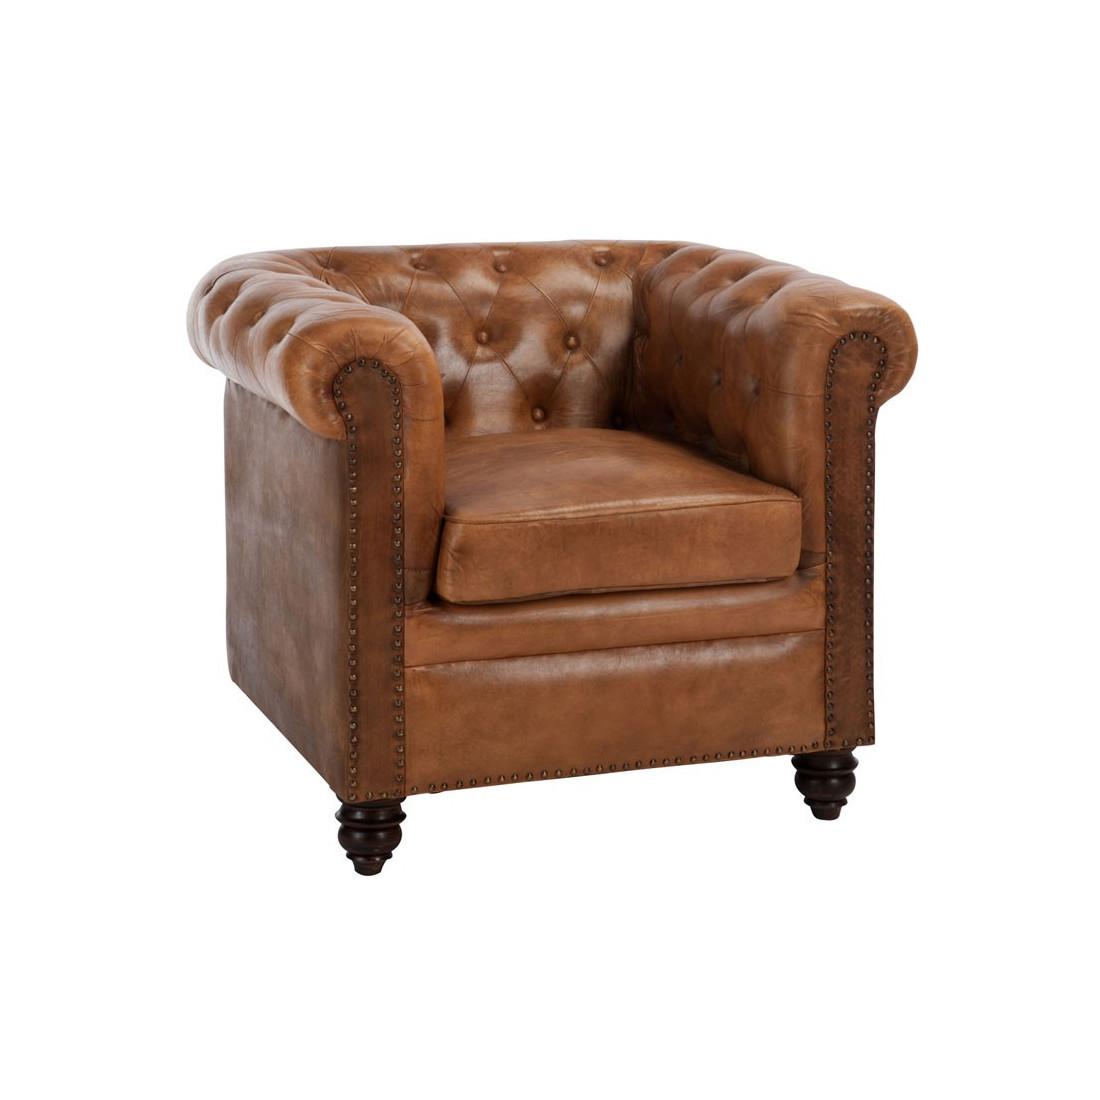 fauteuil chesterfield cuir fieldman univers du salon et chesterfield. Black Bedroom Furniture Sets. Home Design Ideas